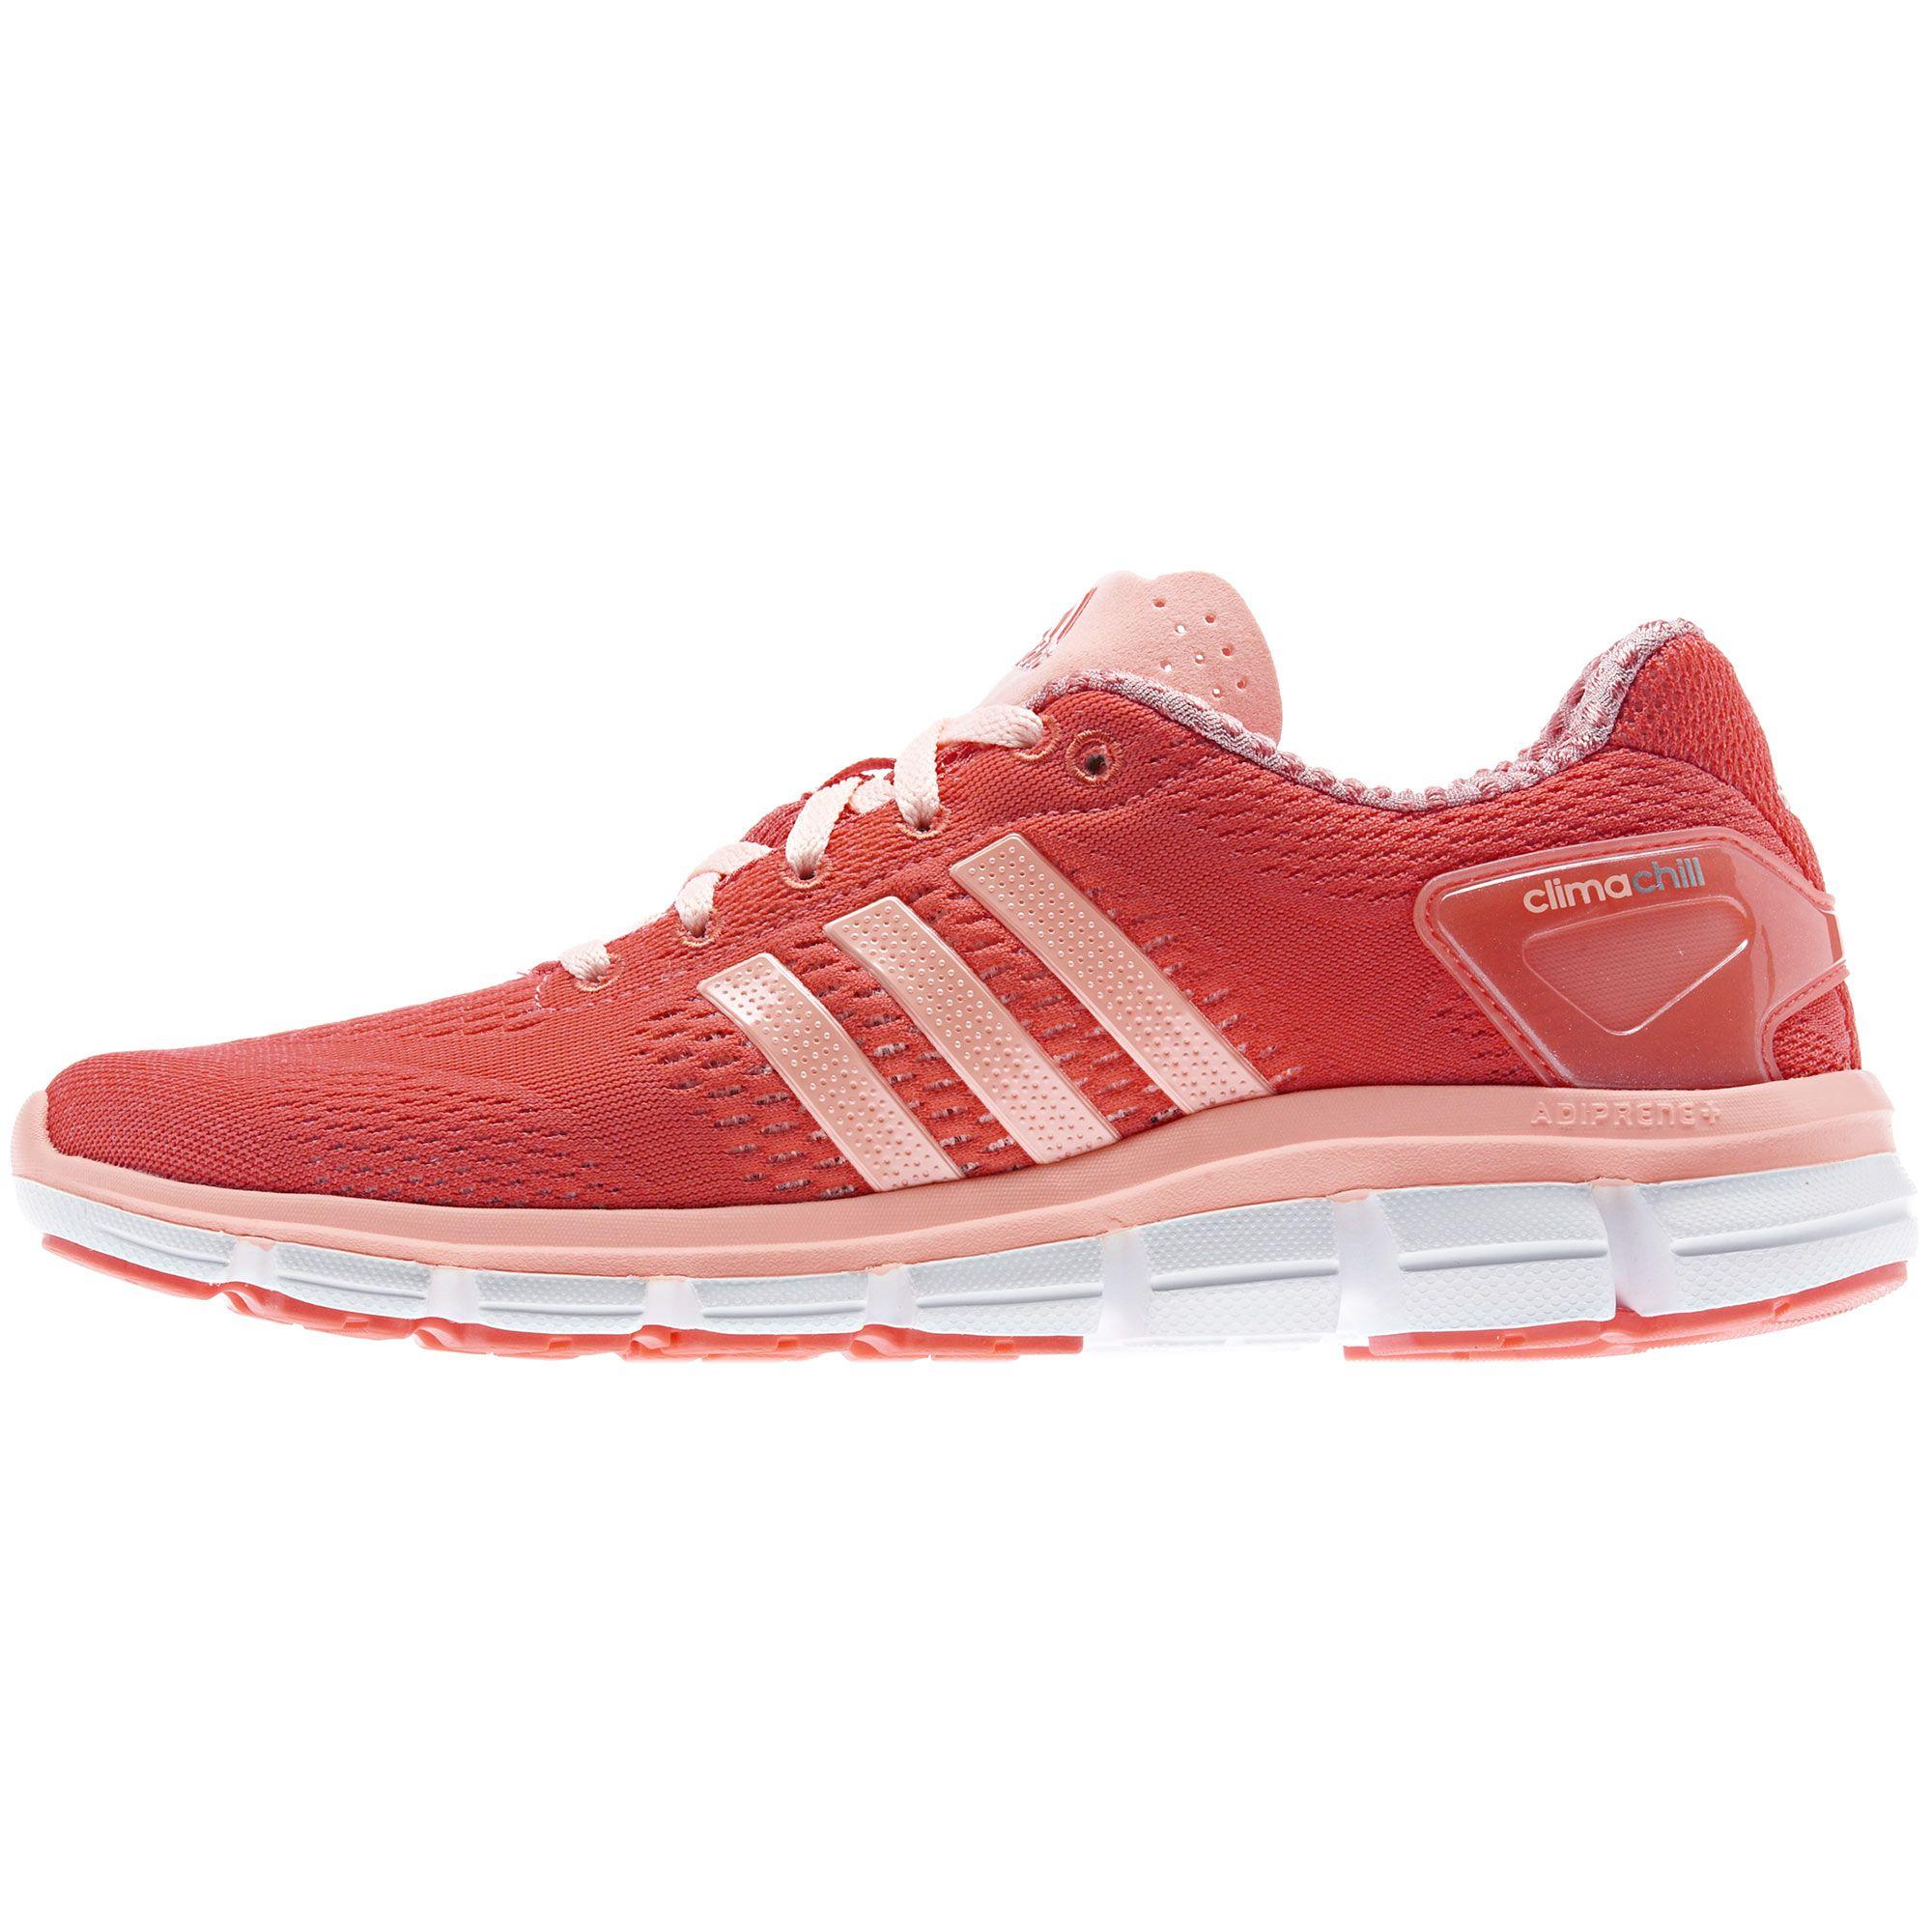 244fba3bc Zapatillas de Running CC Ride Mujer adidas | adidas Chile | Moda mujer